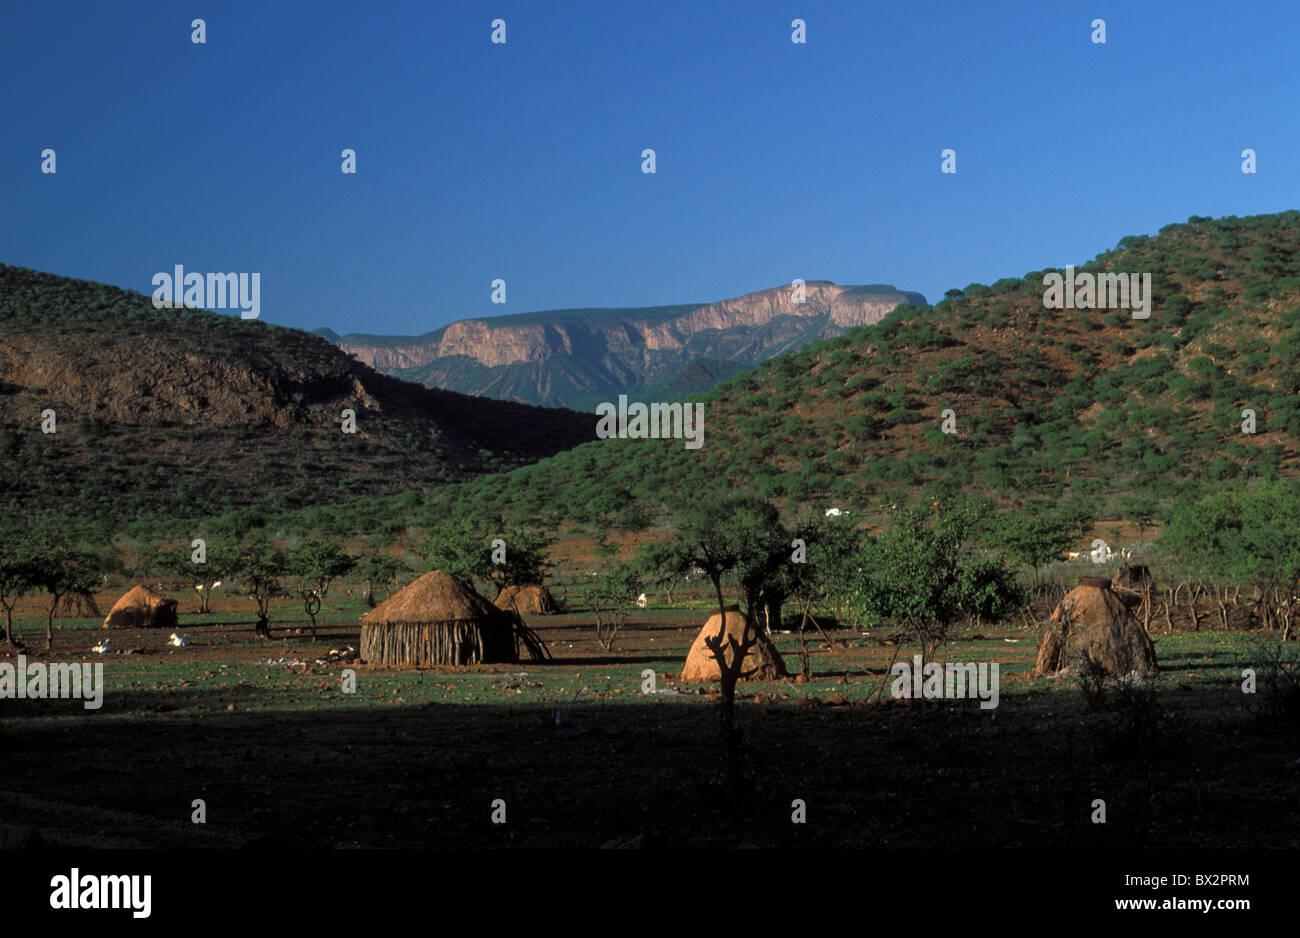 Africa Himba Huts inside Kaokoveld Kraal Namibia Africa nocmadic Ovahimba people rainy season tribe - Stock Image